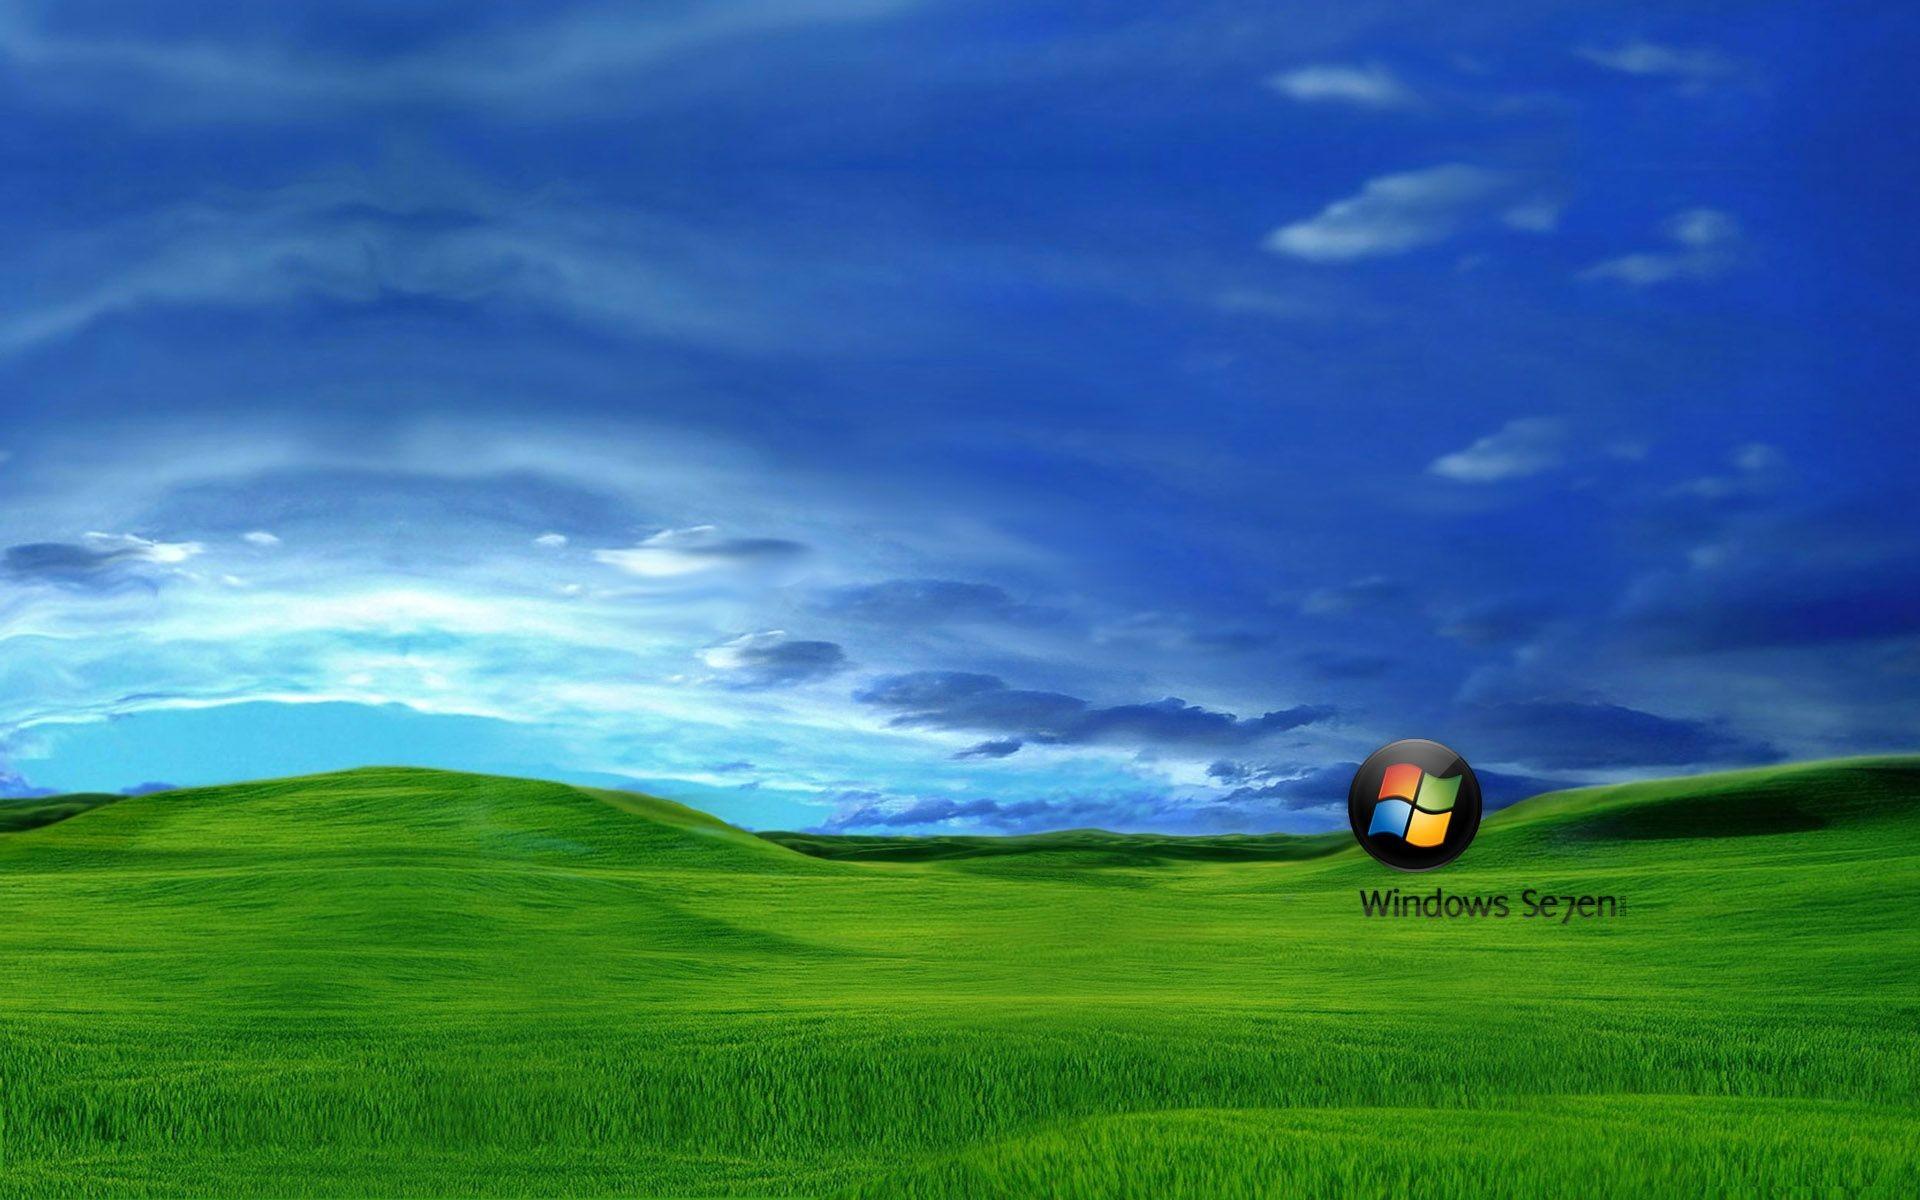 Windows XP Wallpaper Location Free wallpaper download 1920×1200